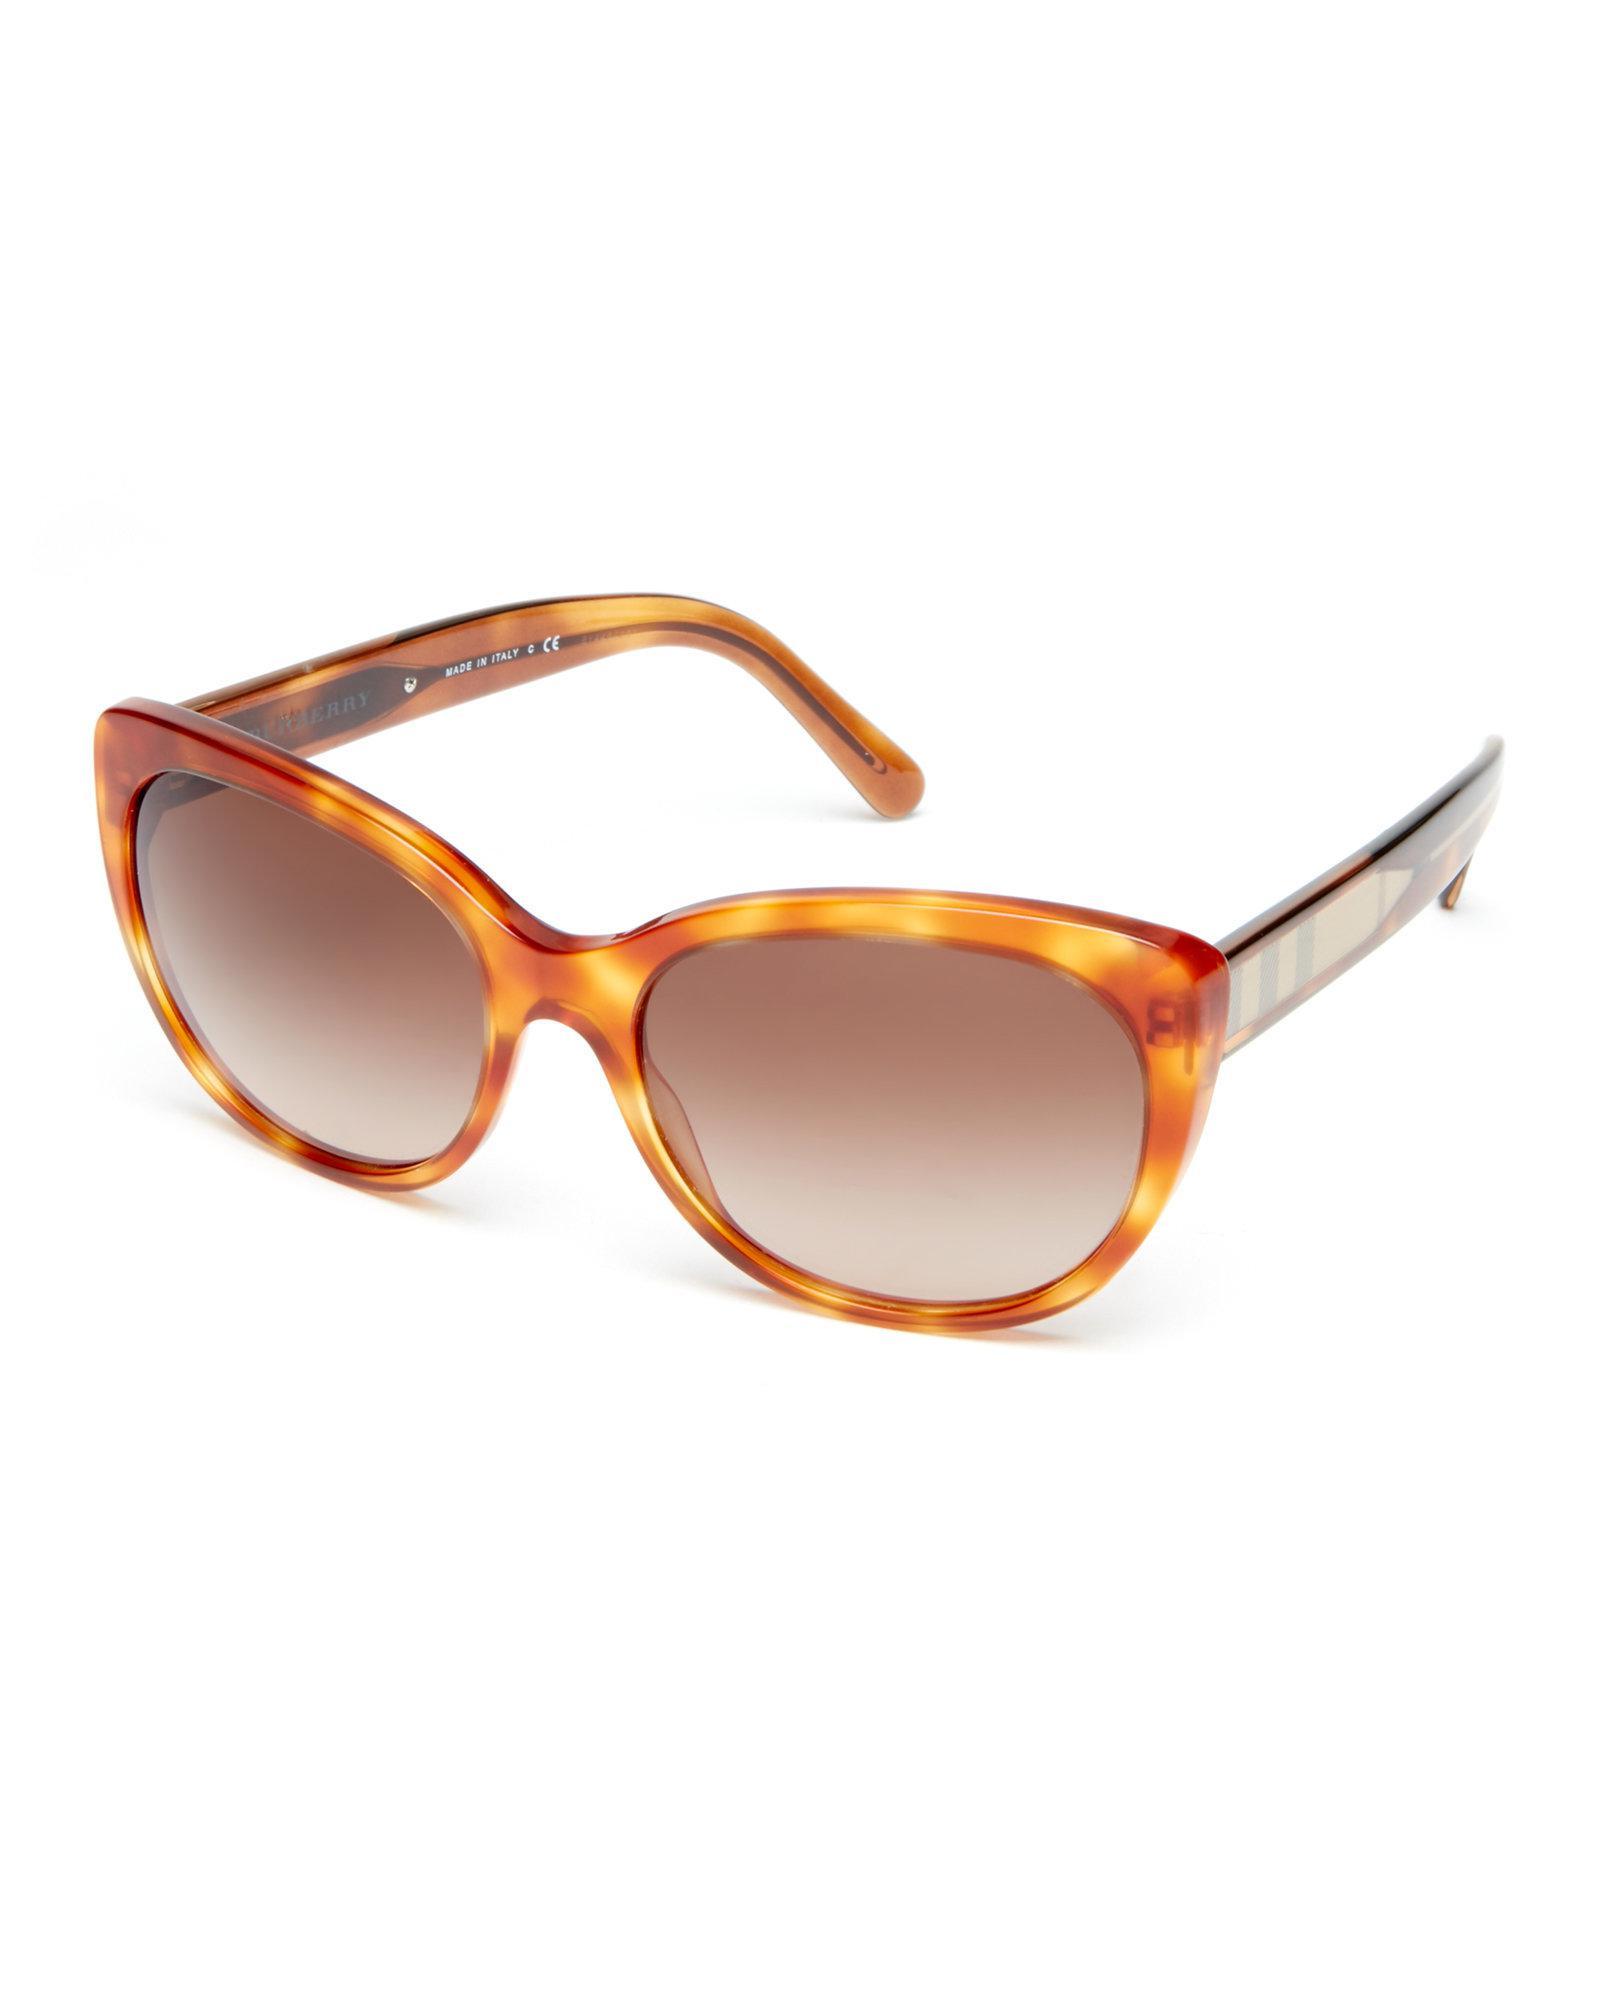 0374e885e47f Lyst - Burberry Be4224 Honey Tortoiseshell-Look Cat Eye Sunglasses ...